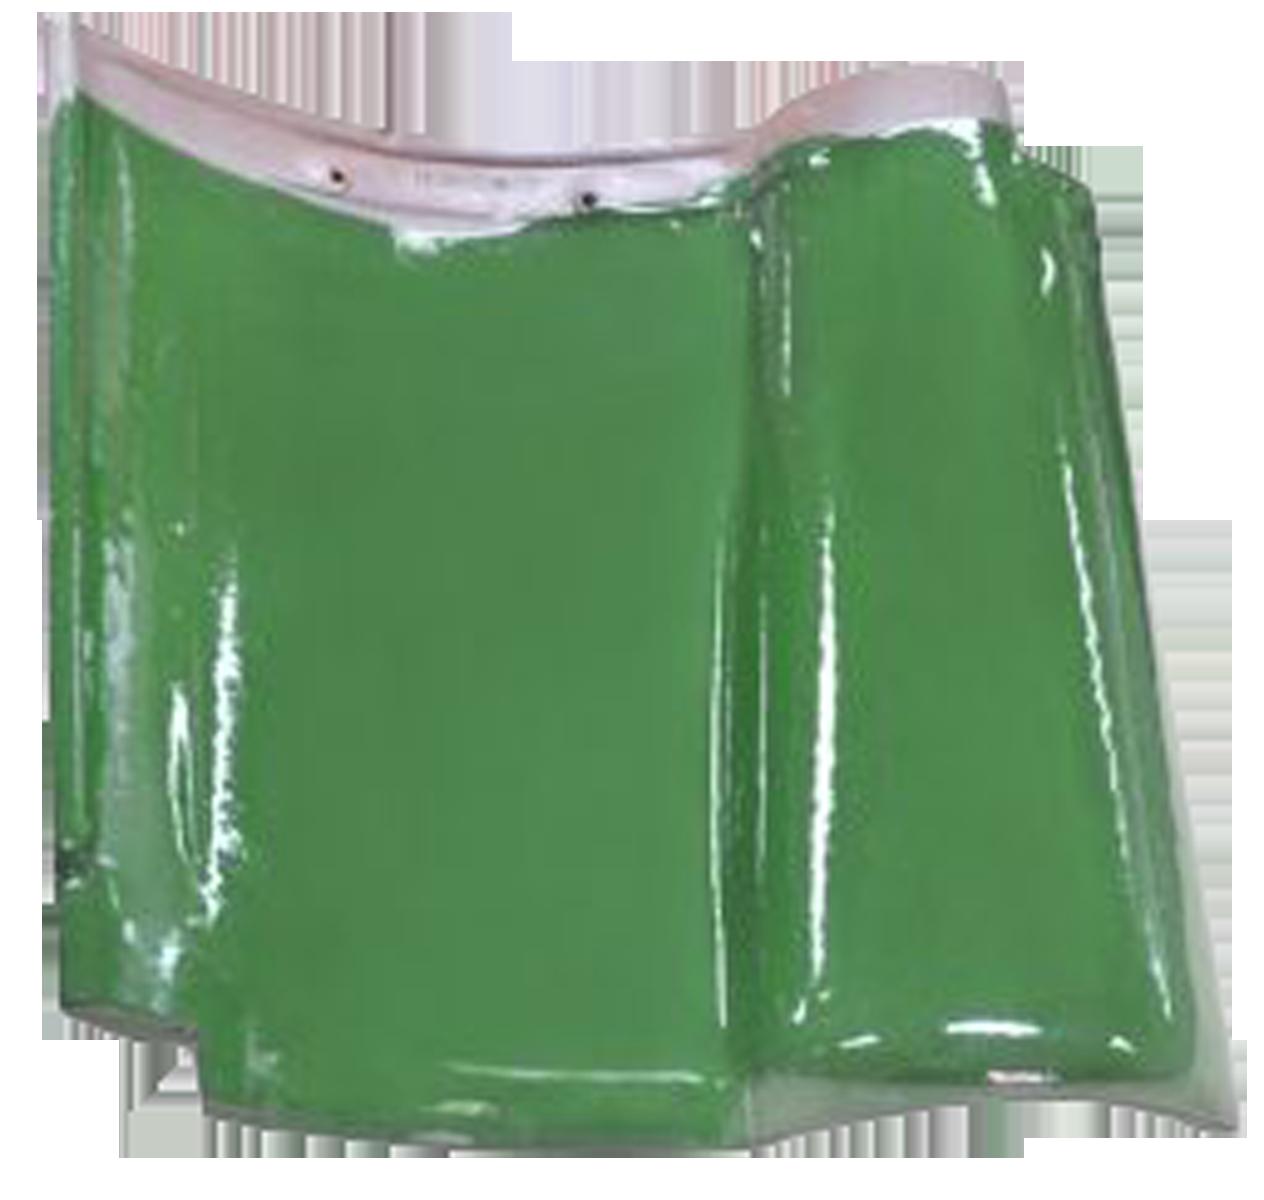 Genteng KIA Jade Green